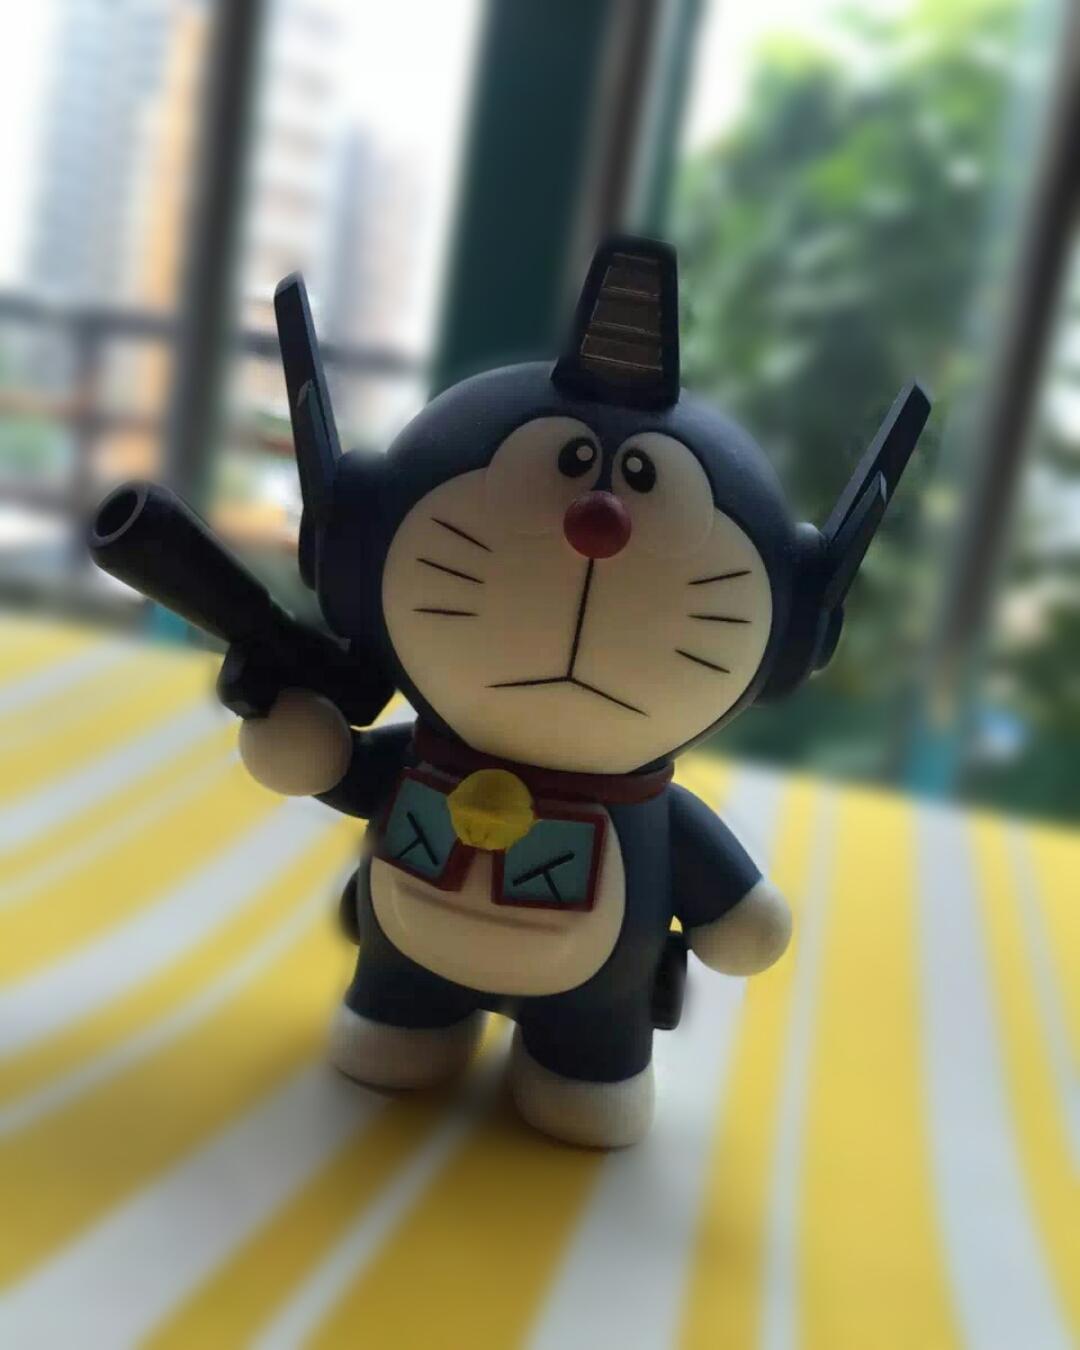 Doraemon print and text